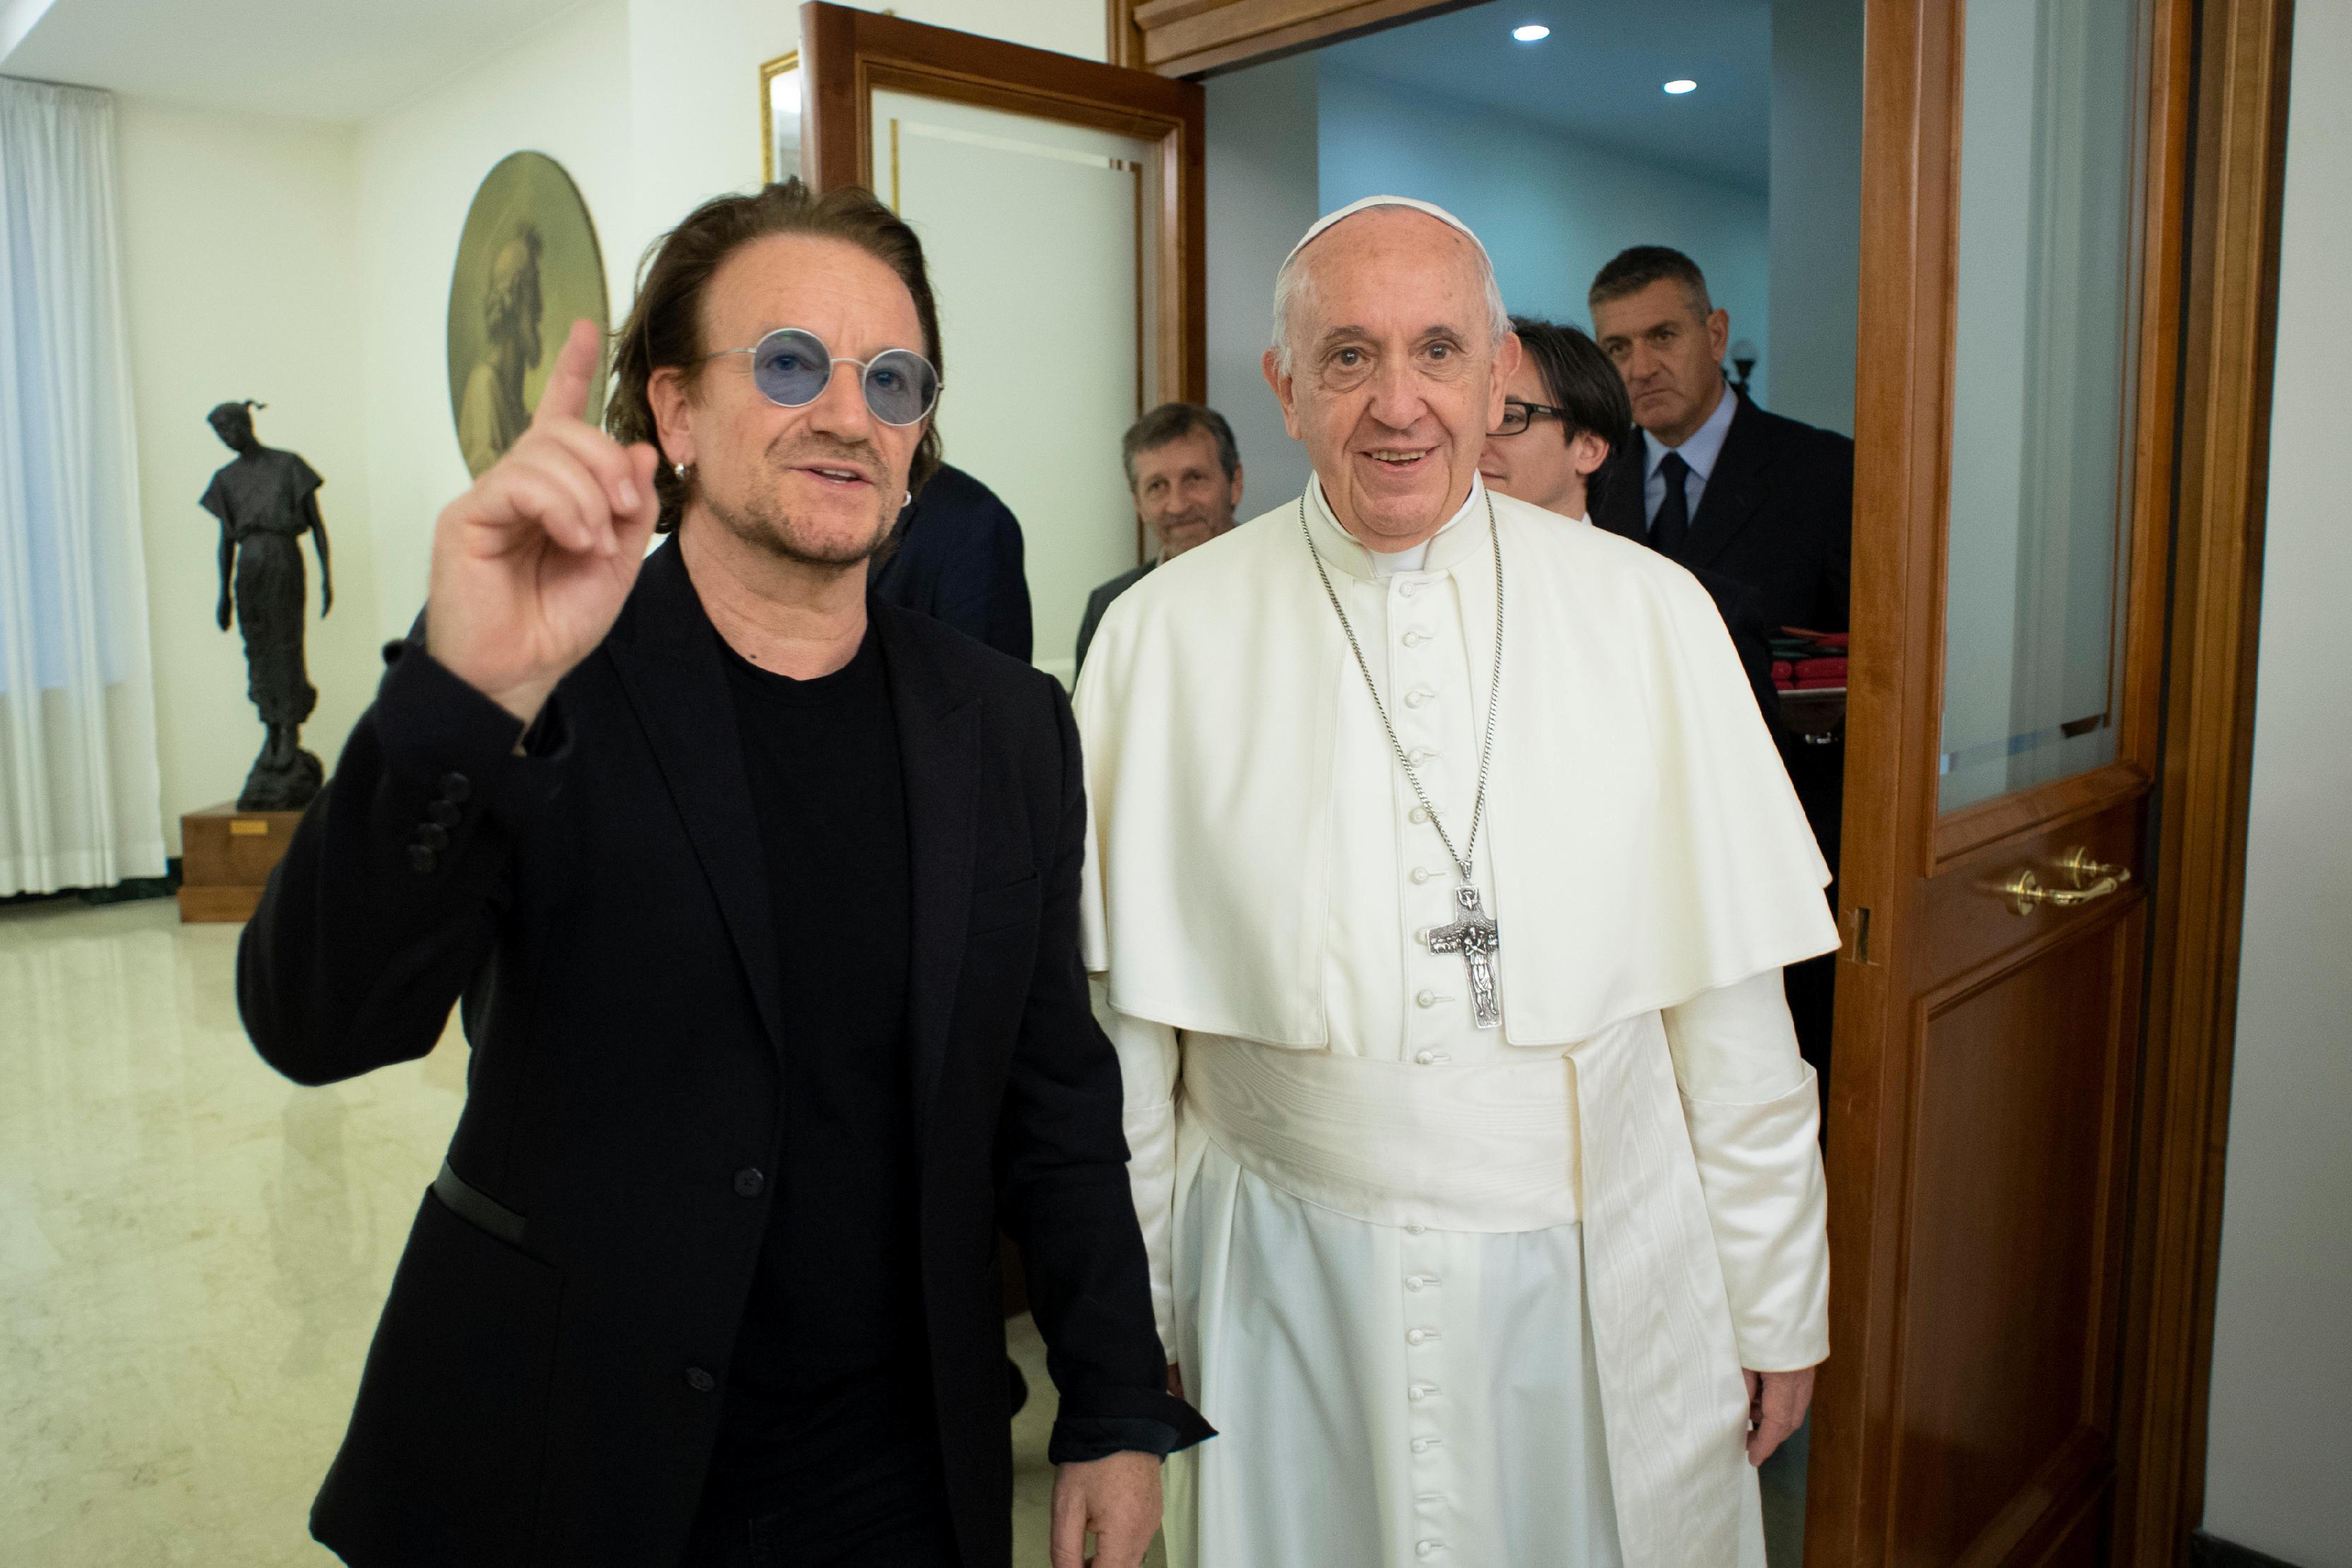 U2 frontman Bono met Pope Francis at the Vatican on Sept. 19.